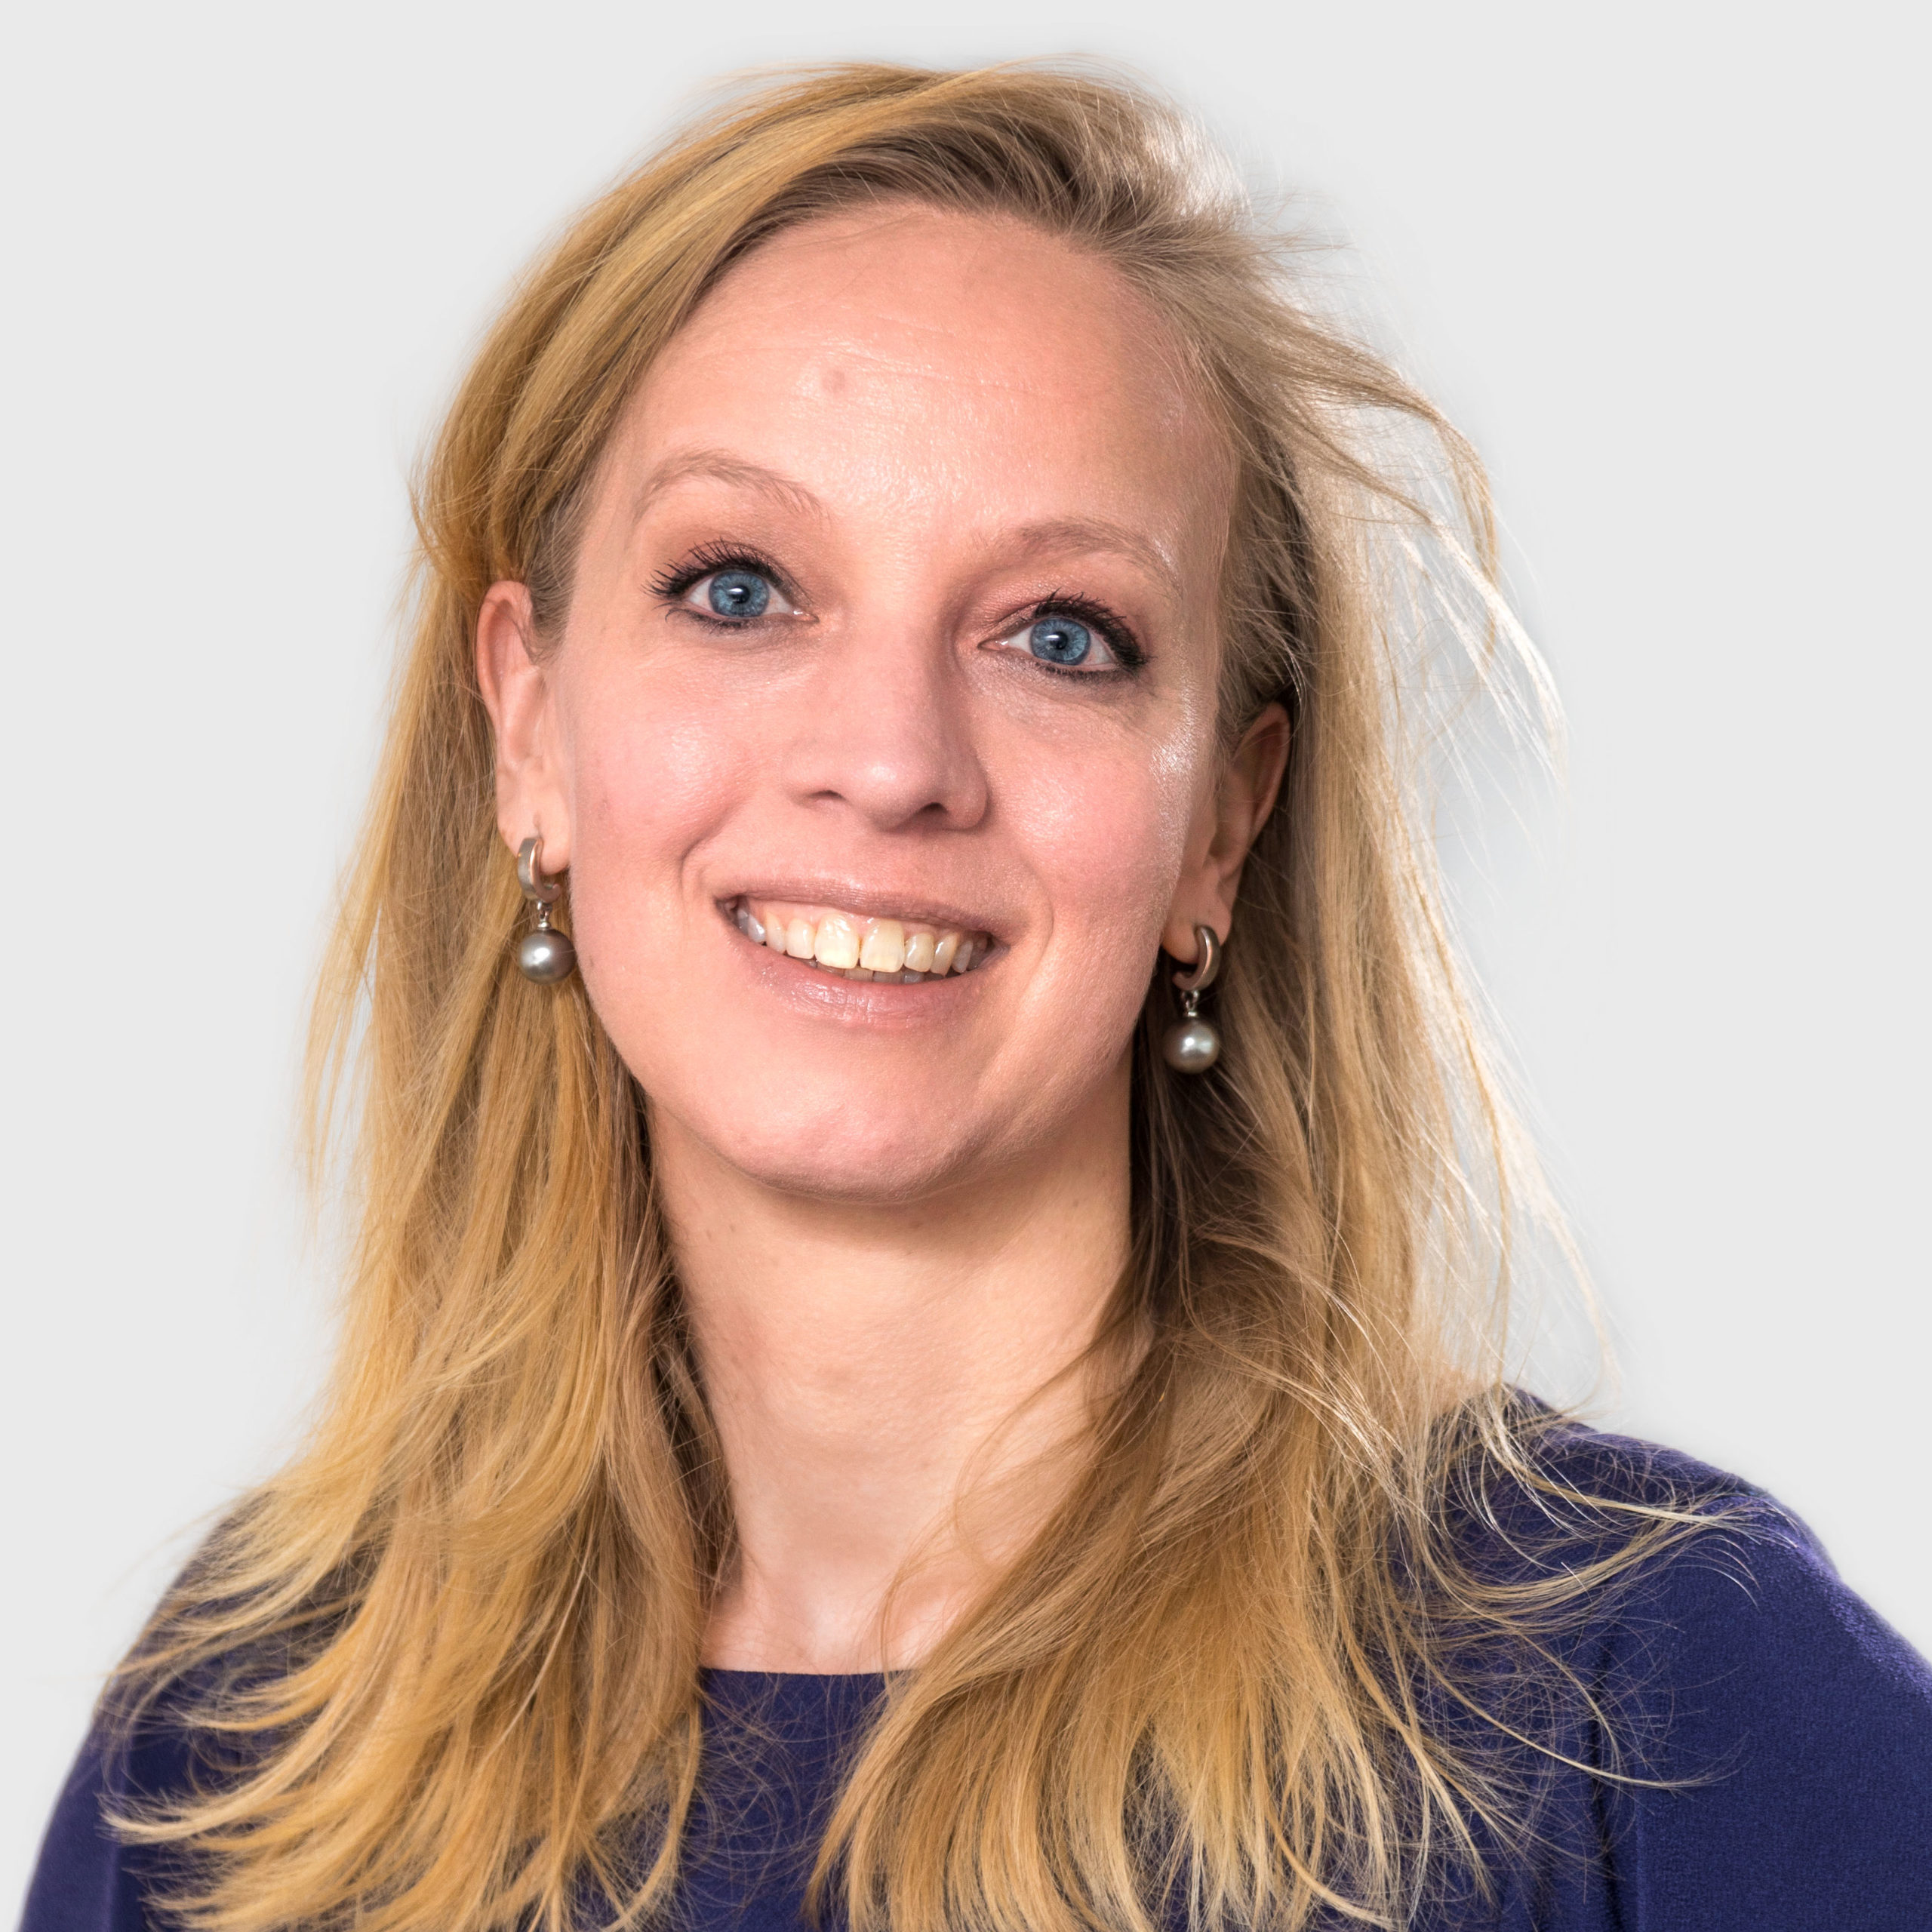 Marieke Beekman Prodeba klachtencommissie